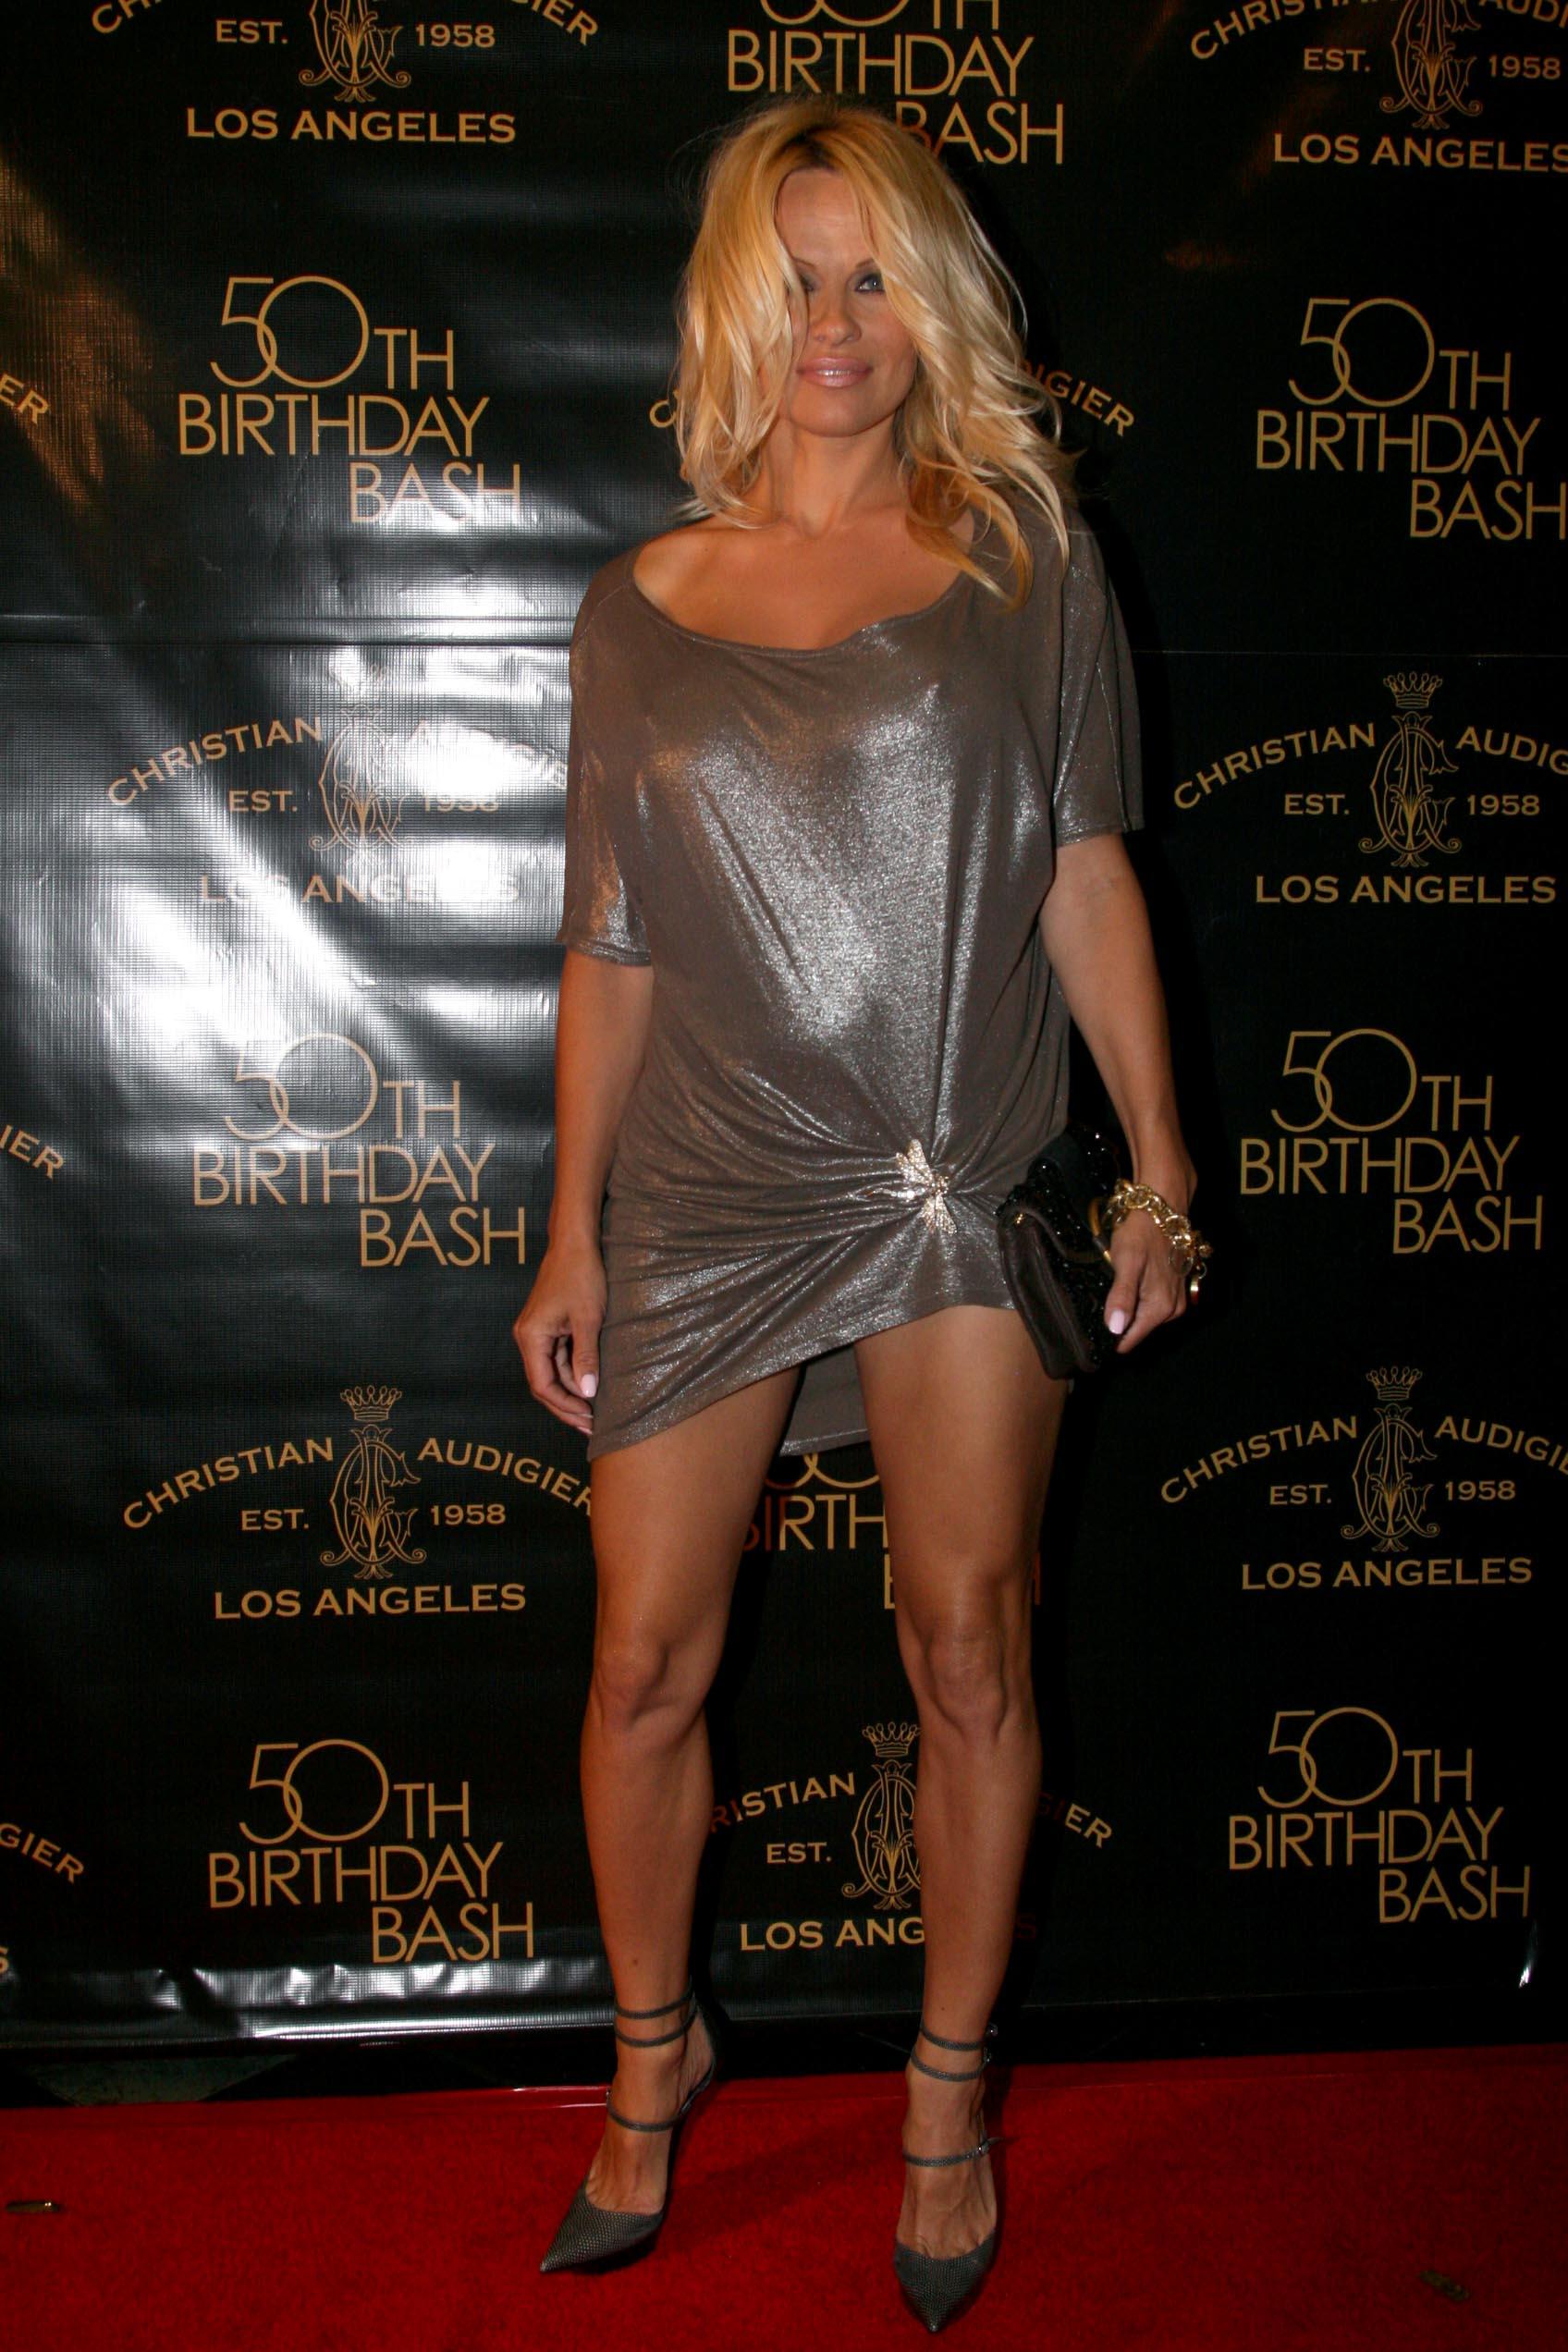 49207_Celebutopia-Pamela_Anderson-Designer_Christian_Audigier84s_50th_Birthday_Bash-07_122_518lo.jpg